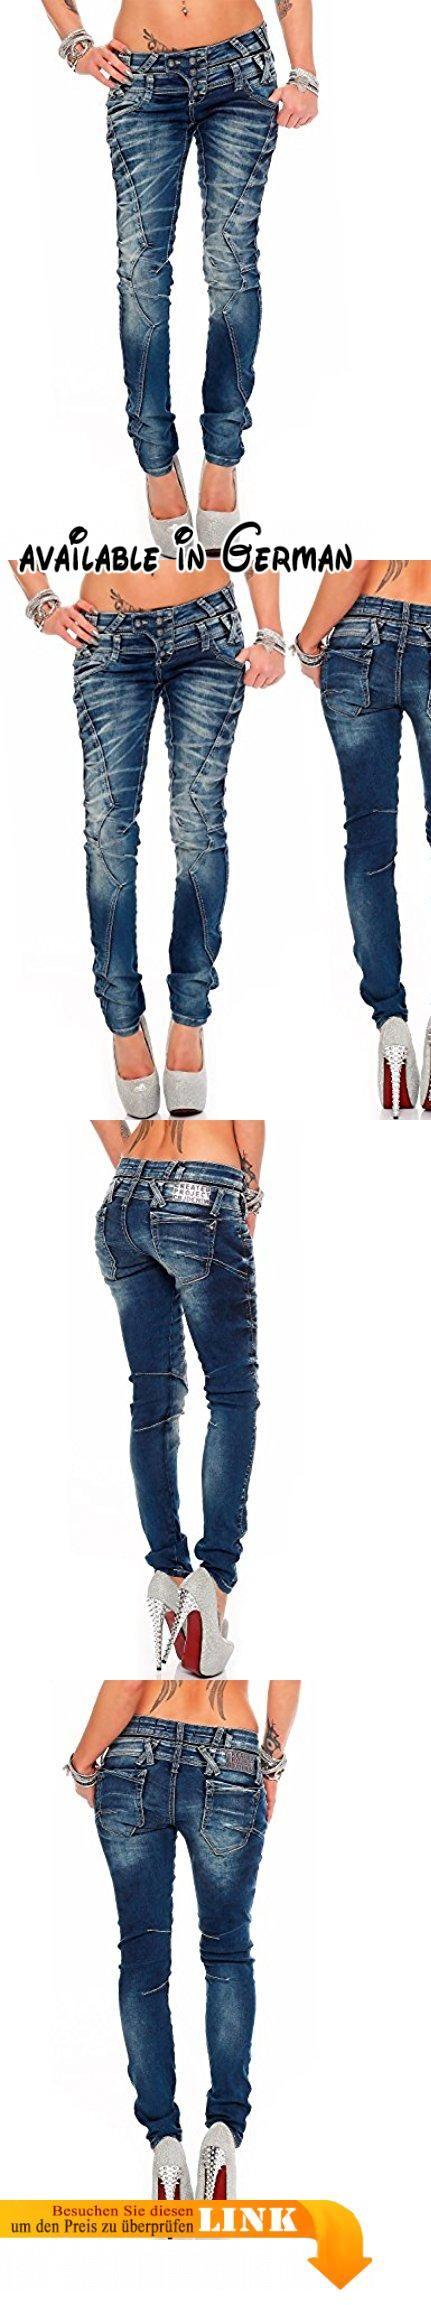 Cipo & Baxx Damen Jeans WD250 W28/L34. Slim-Fit. Teilungsnähte auf den Hosenbeinen. 86% Baumwolle 4% Polyester 10% Elasthan. Blau. Model 28 - bans24 - Cipo & Baxx #Apparel #PANTS